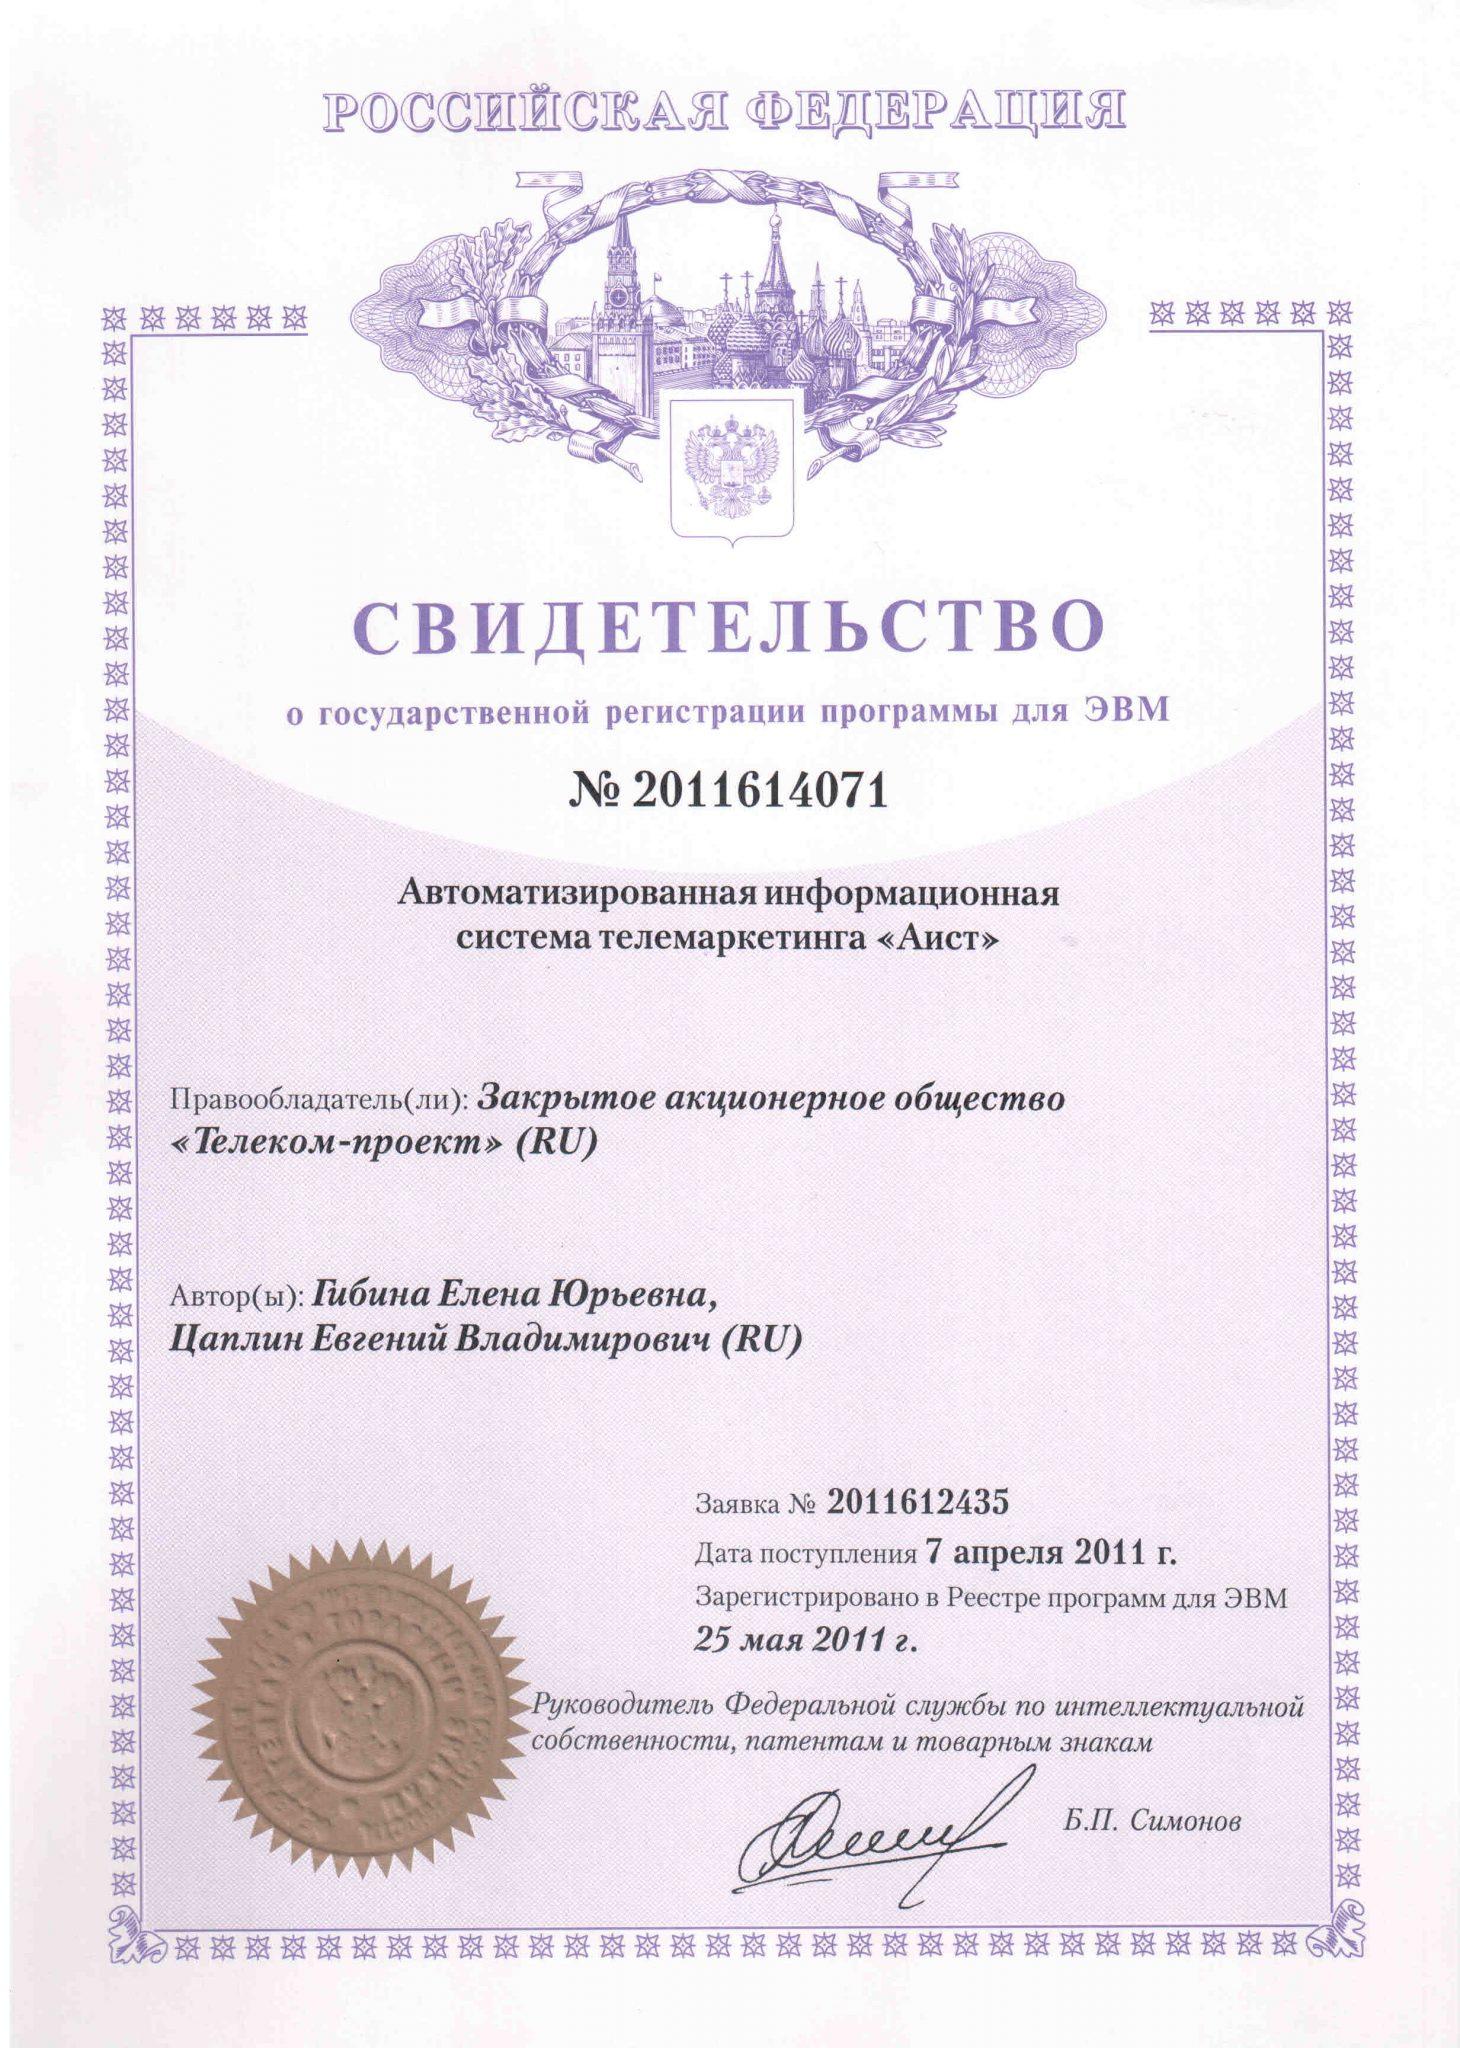 Свидетельство о регистрации АИСТ